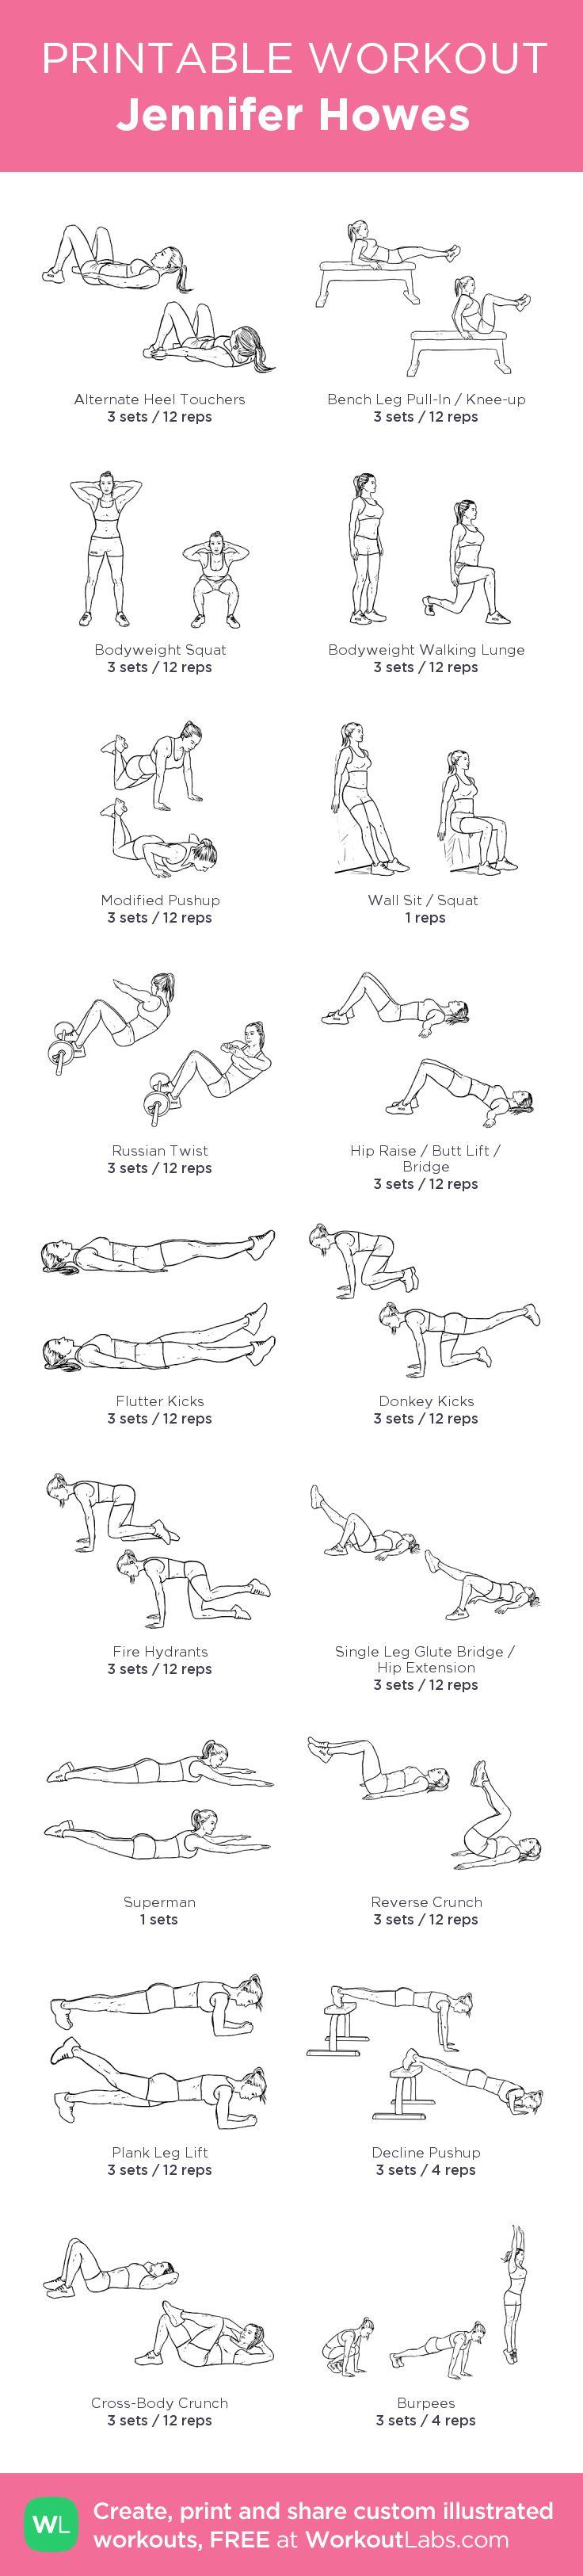 Jennifer Howes:my custom printable workout by @WorkoutLabs #workoutlabs #customworkout